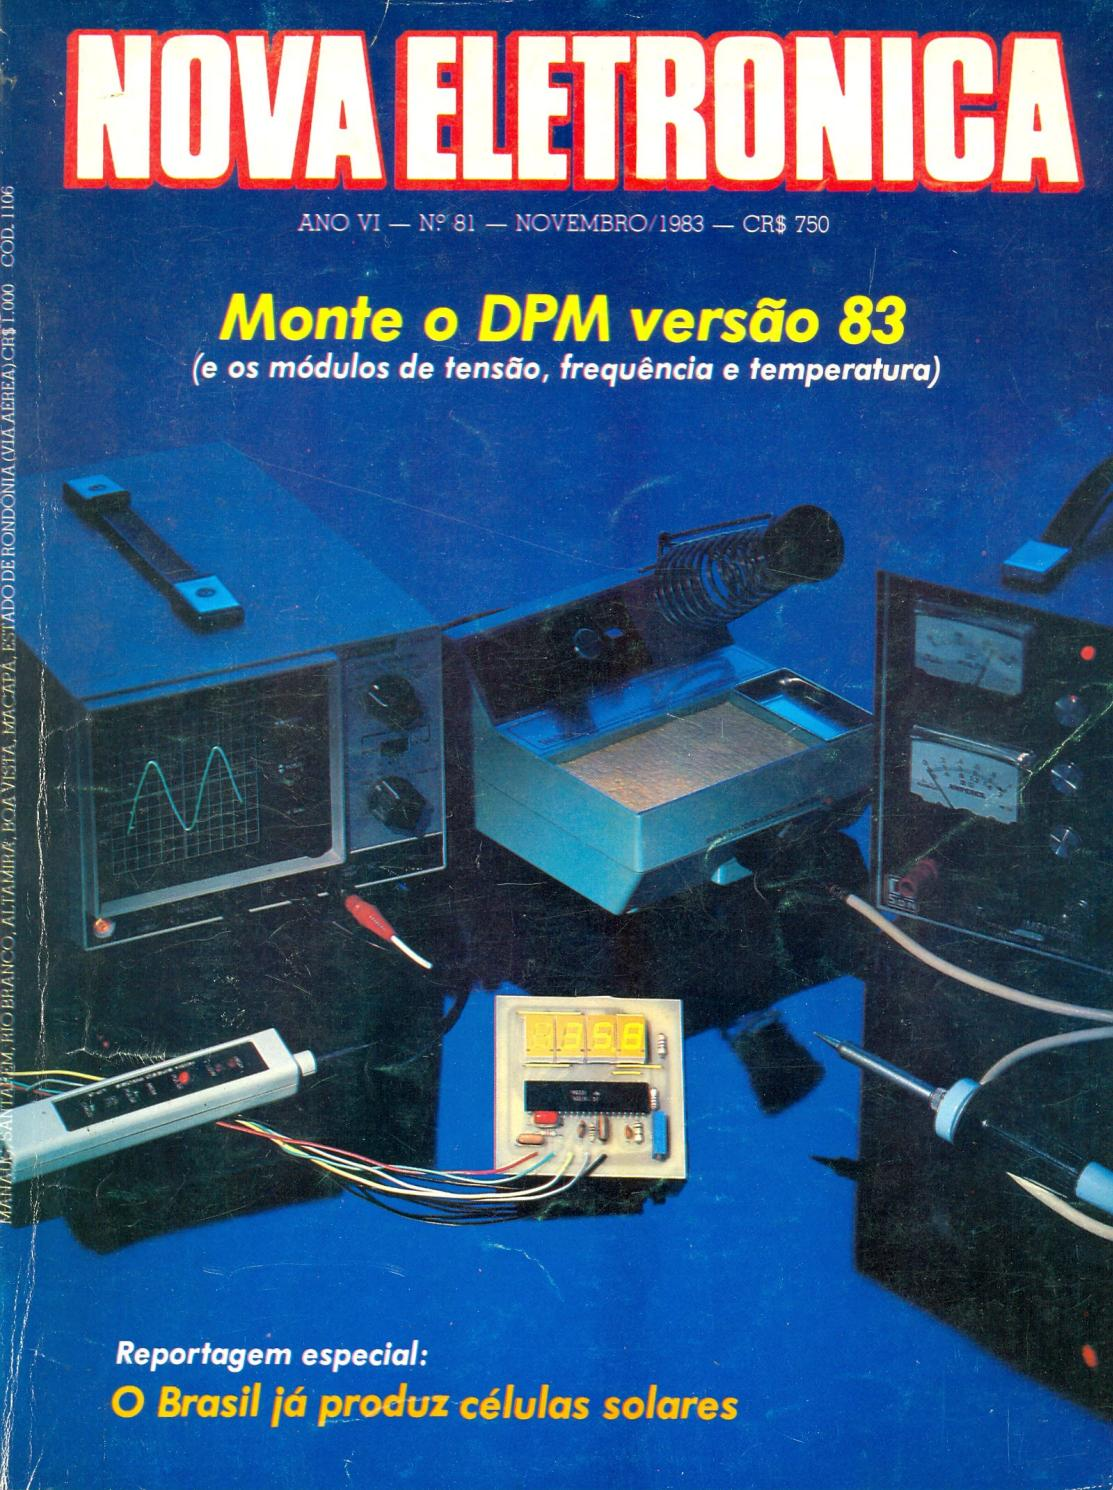 42a17a5ab NOVA ELETRÔNICA nº 81 - Novembro/1983 by Eng. Roberto Carlos Teixeira -  issuu